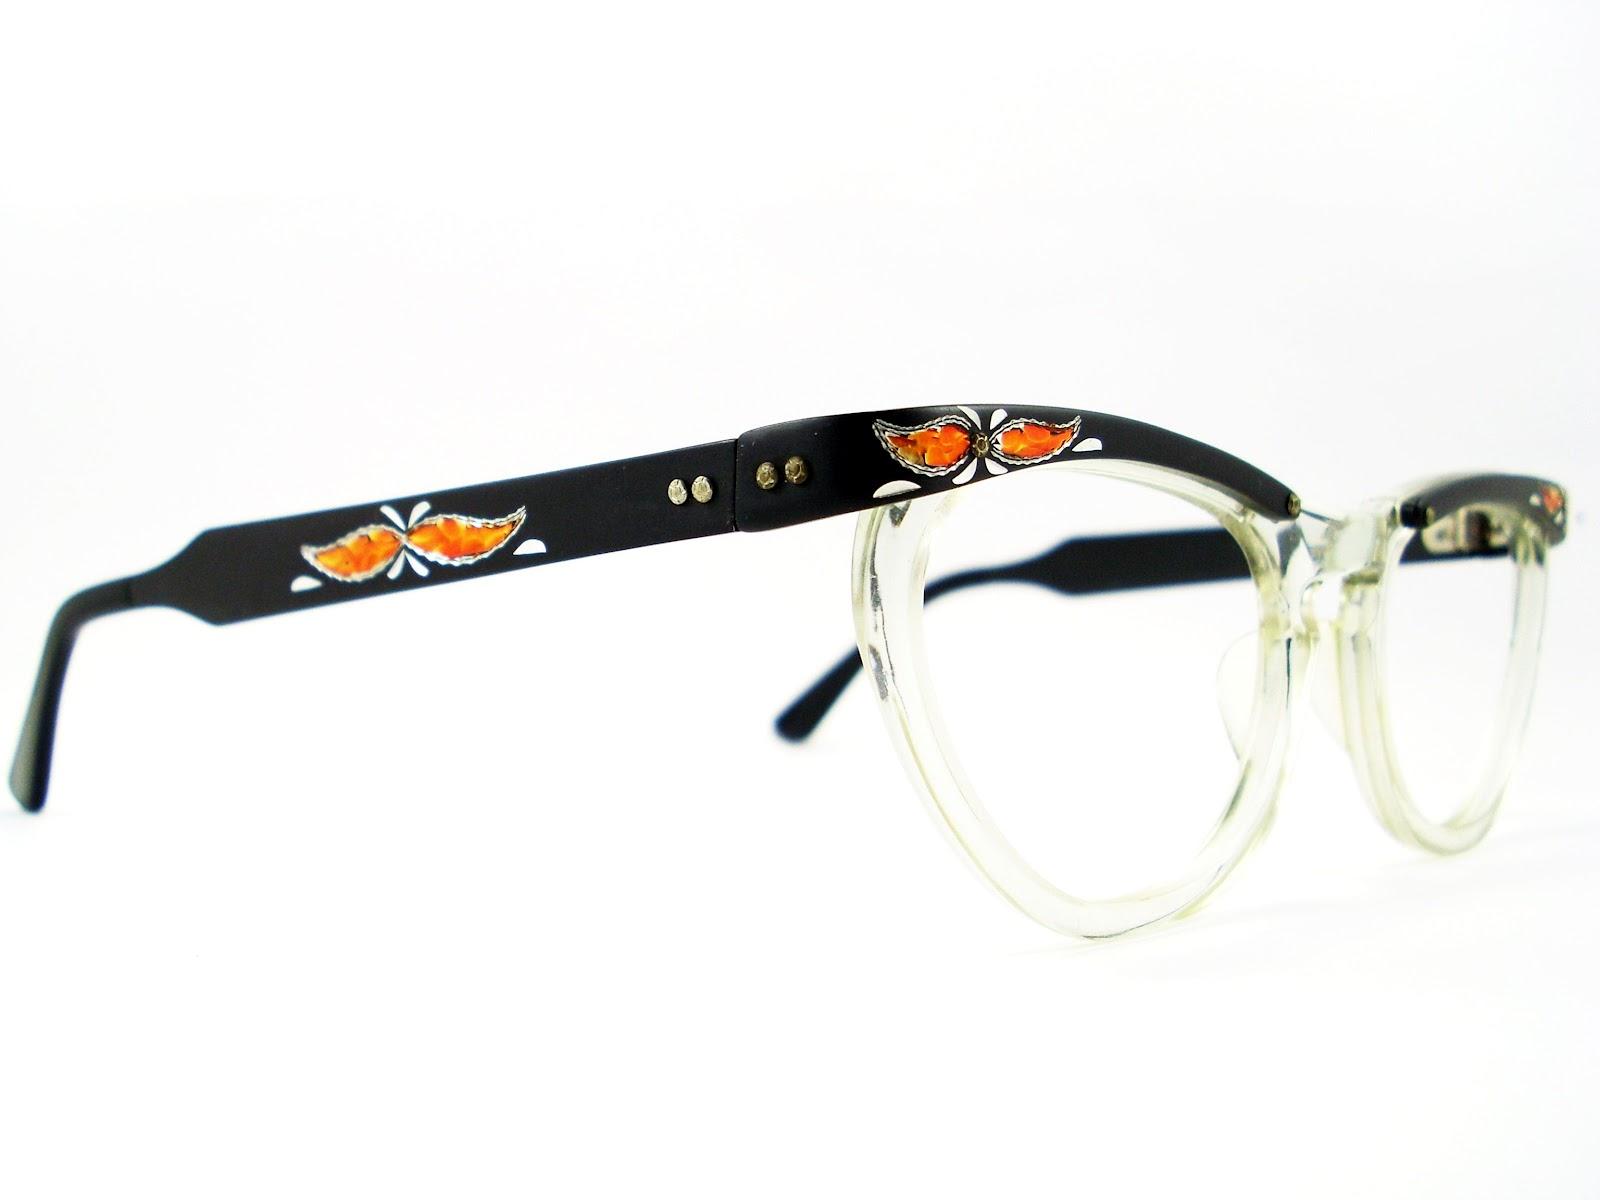 Vintage Eyeglasses Frames Eyewear Sunglasses 50S: VINTAGE ...